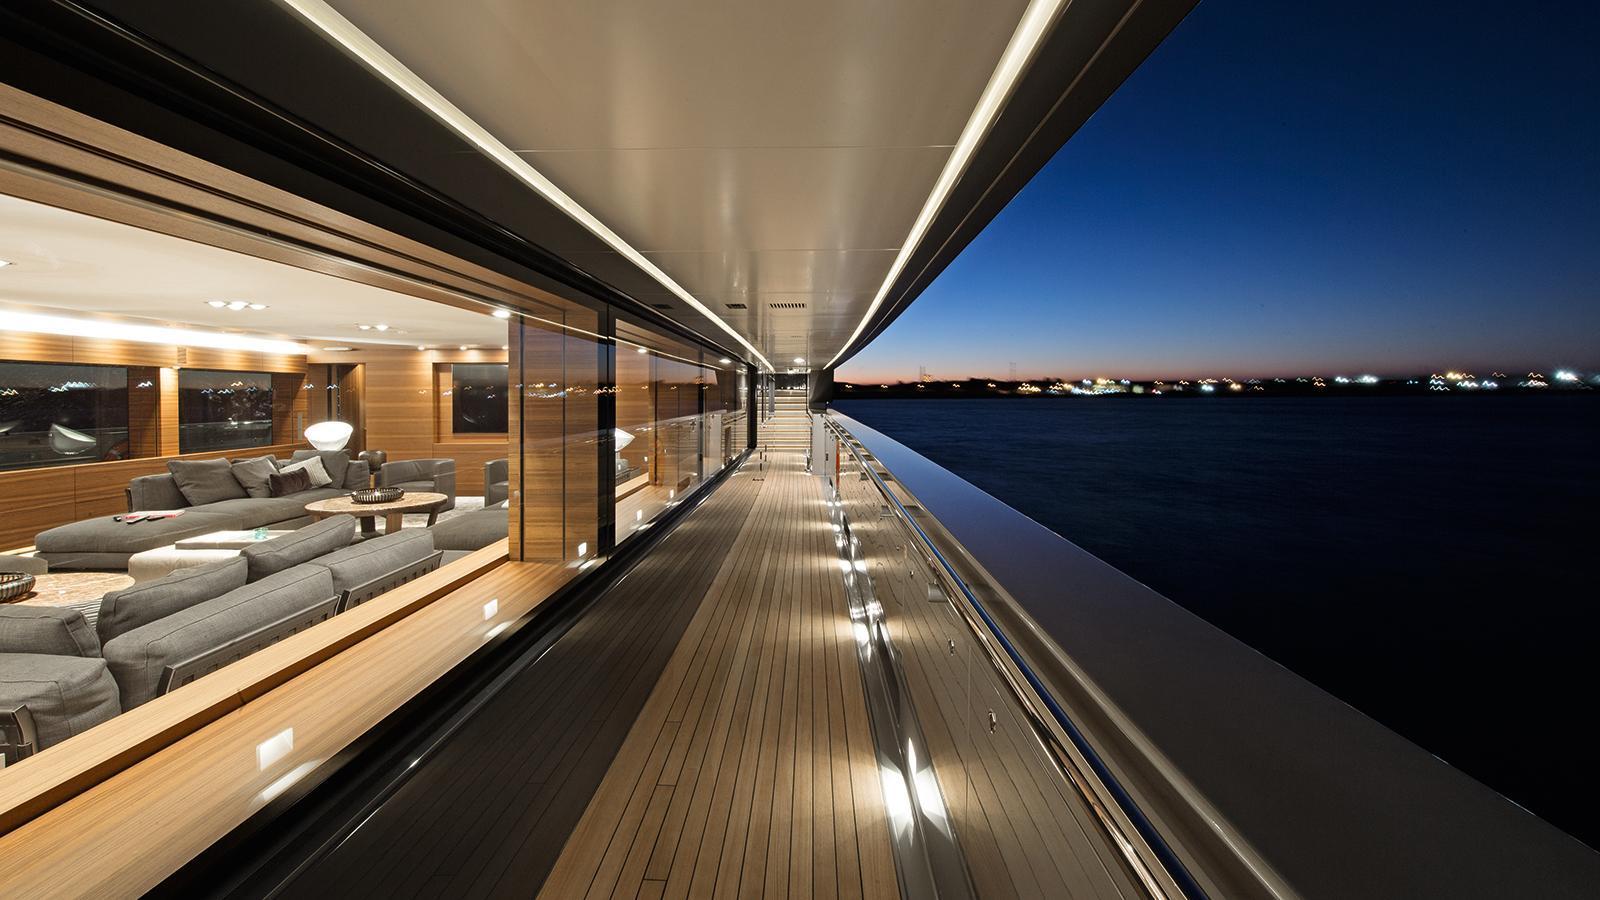 silver-fast-motor-yacht-2015-77m-side-deck-night